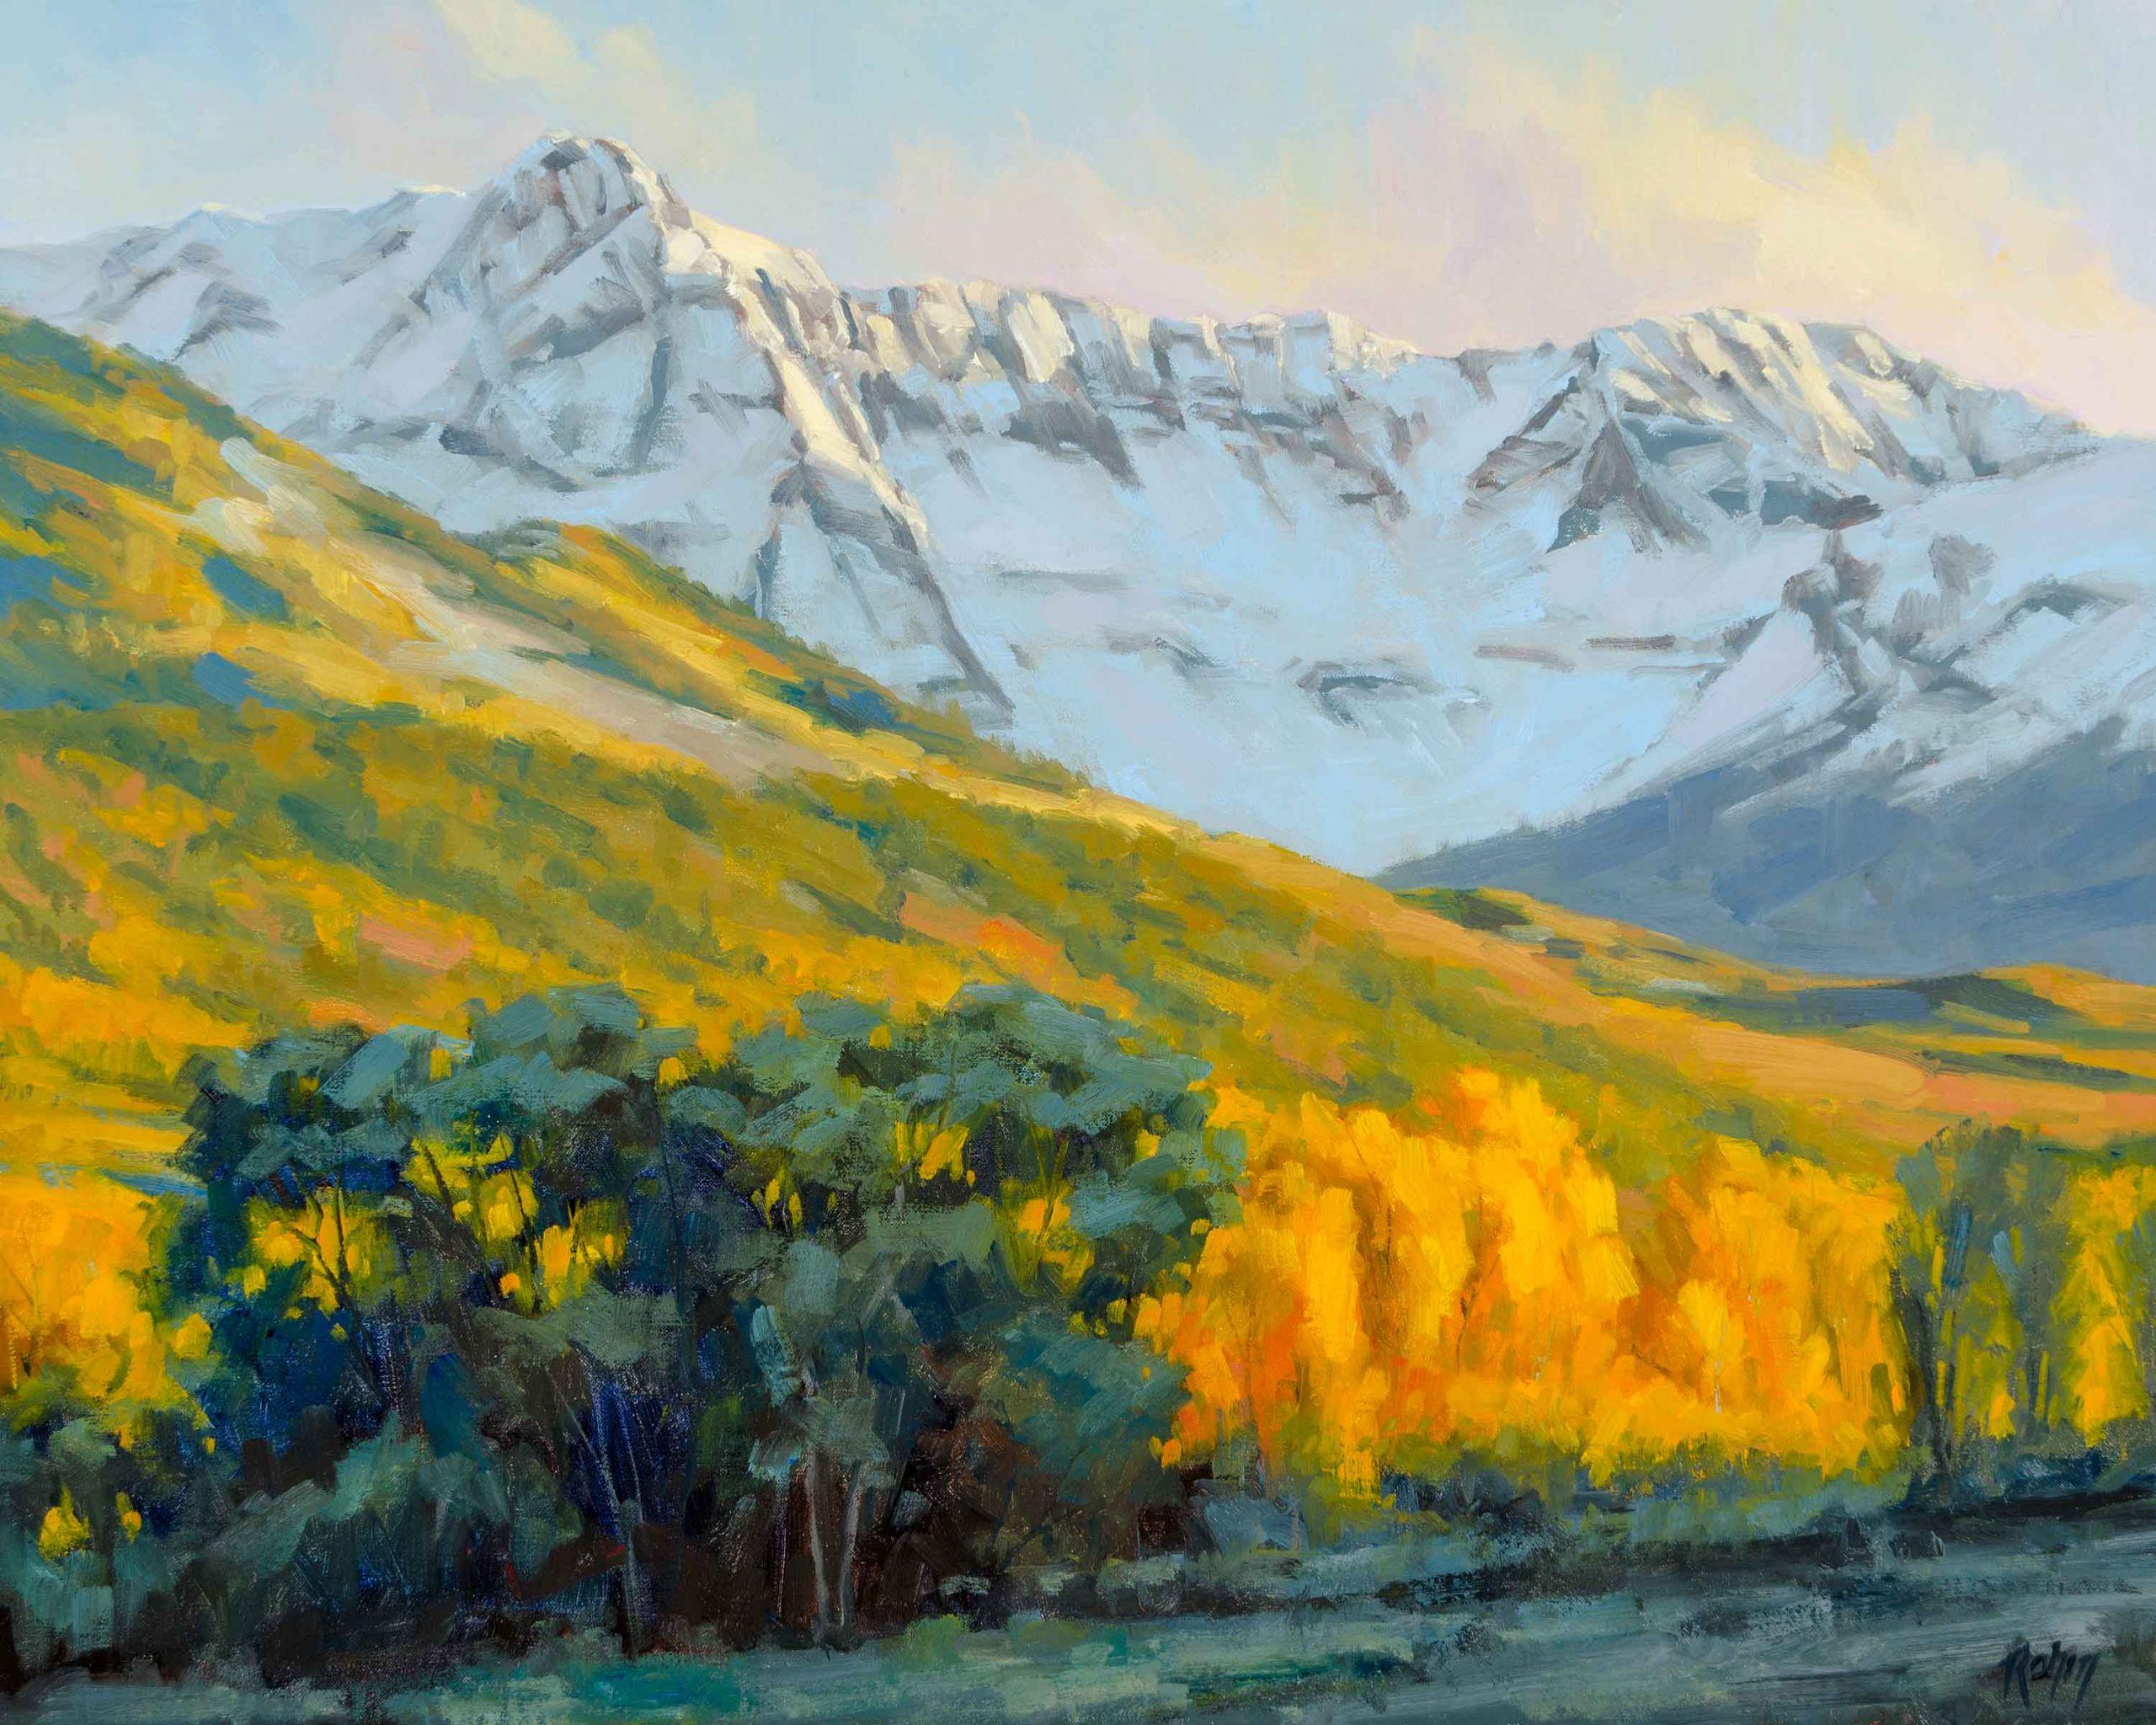 Landscape Painting Images  Painting Landscapes Aspen Trees OutdoorPainter